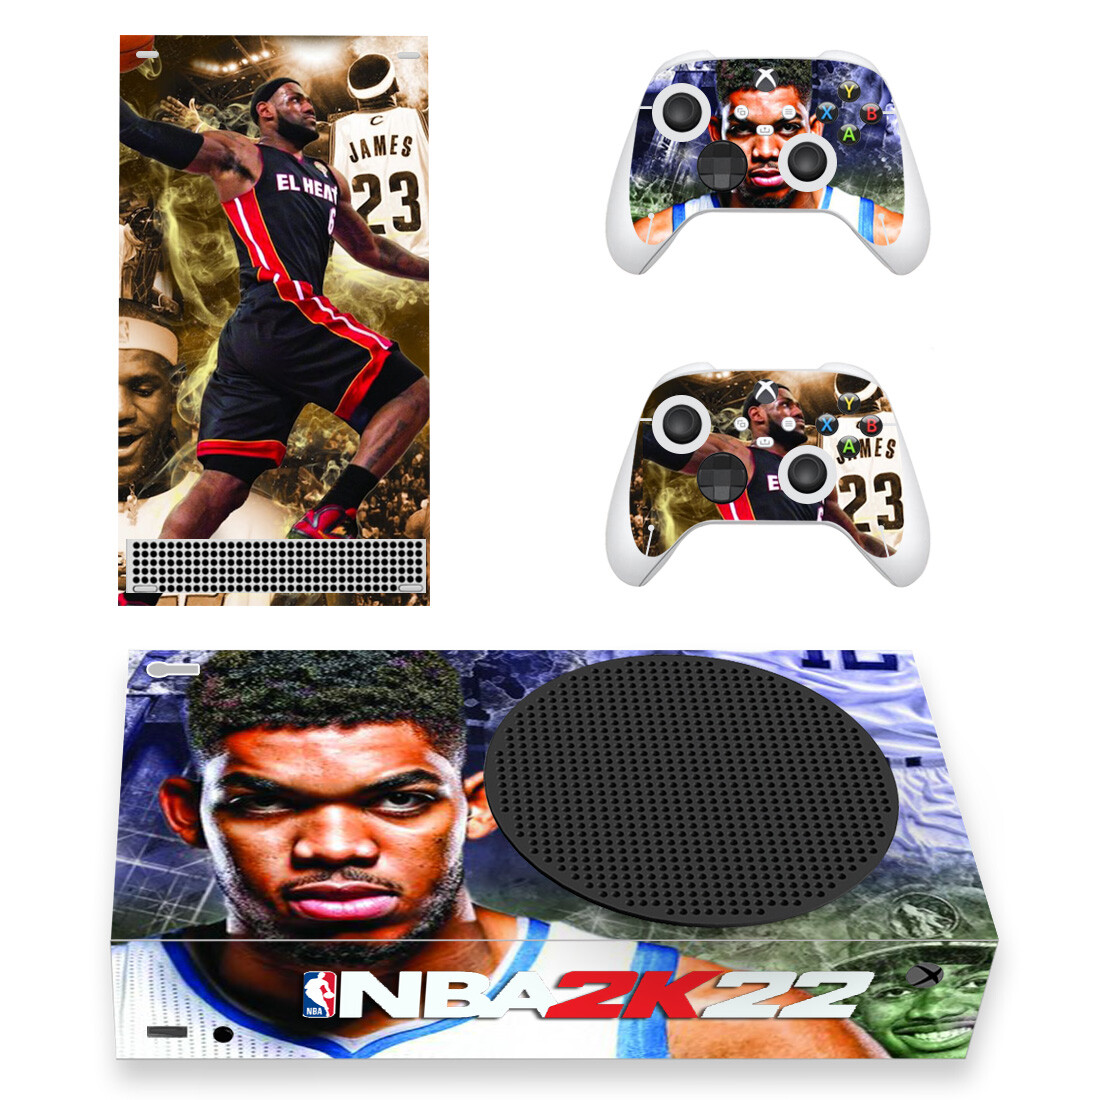 NBA 2K22 Xbox Series S Skin Sticker Decal